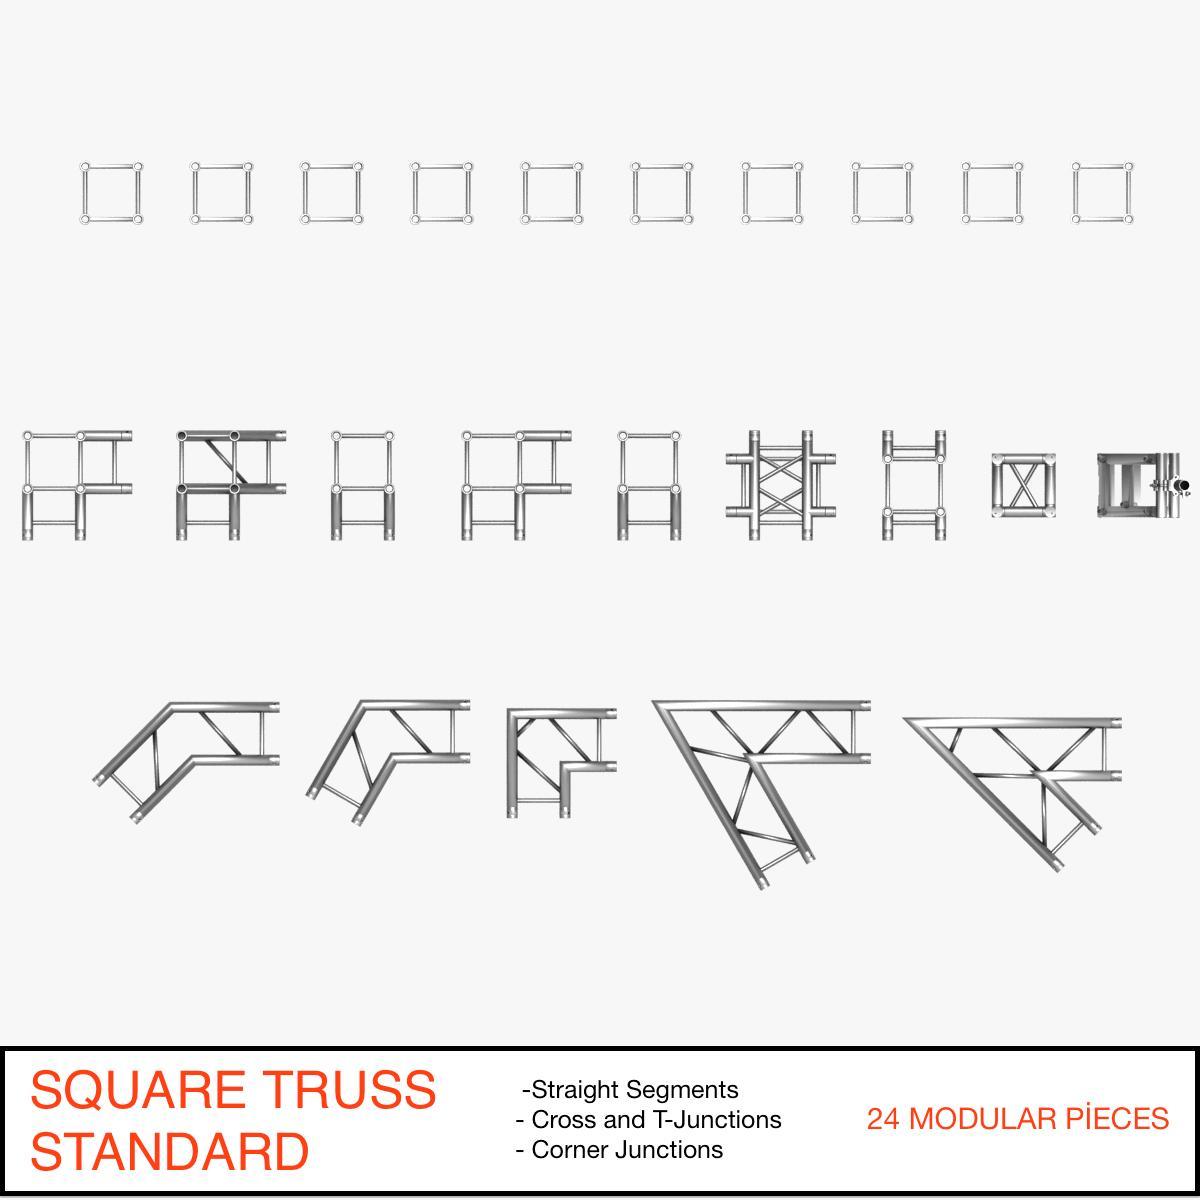 30-04-SquareTrussStandard-2